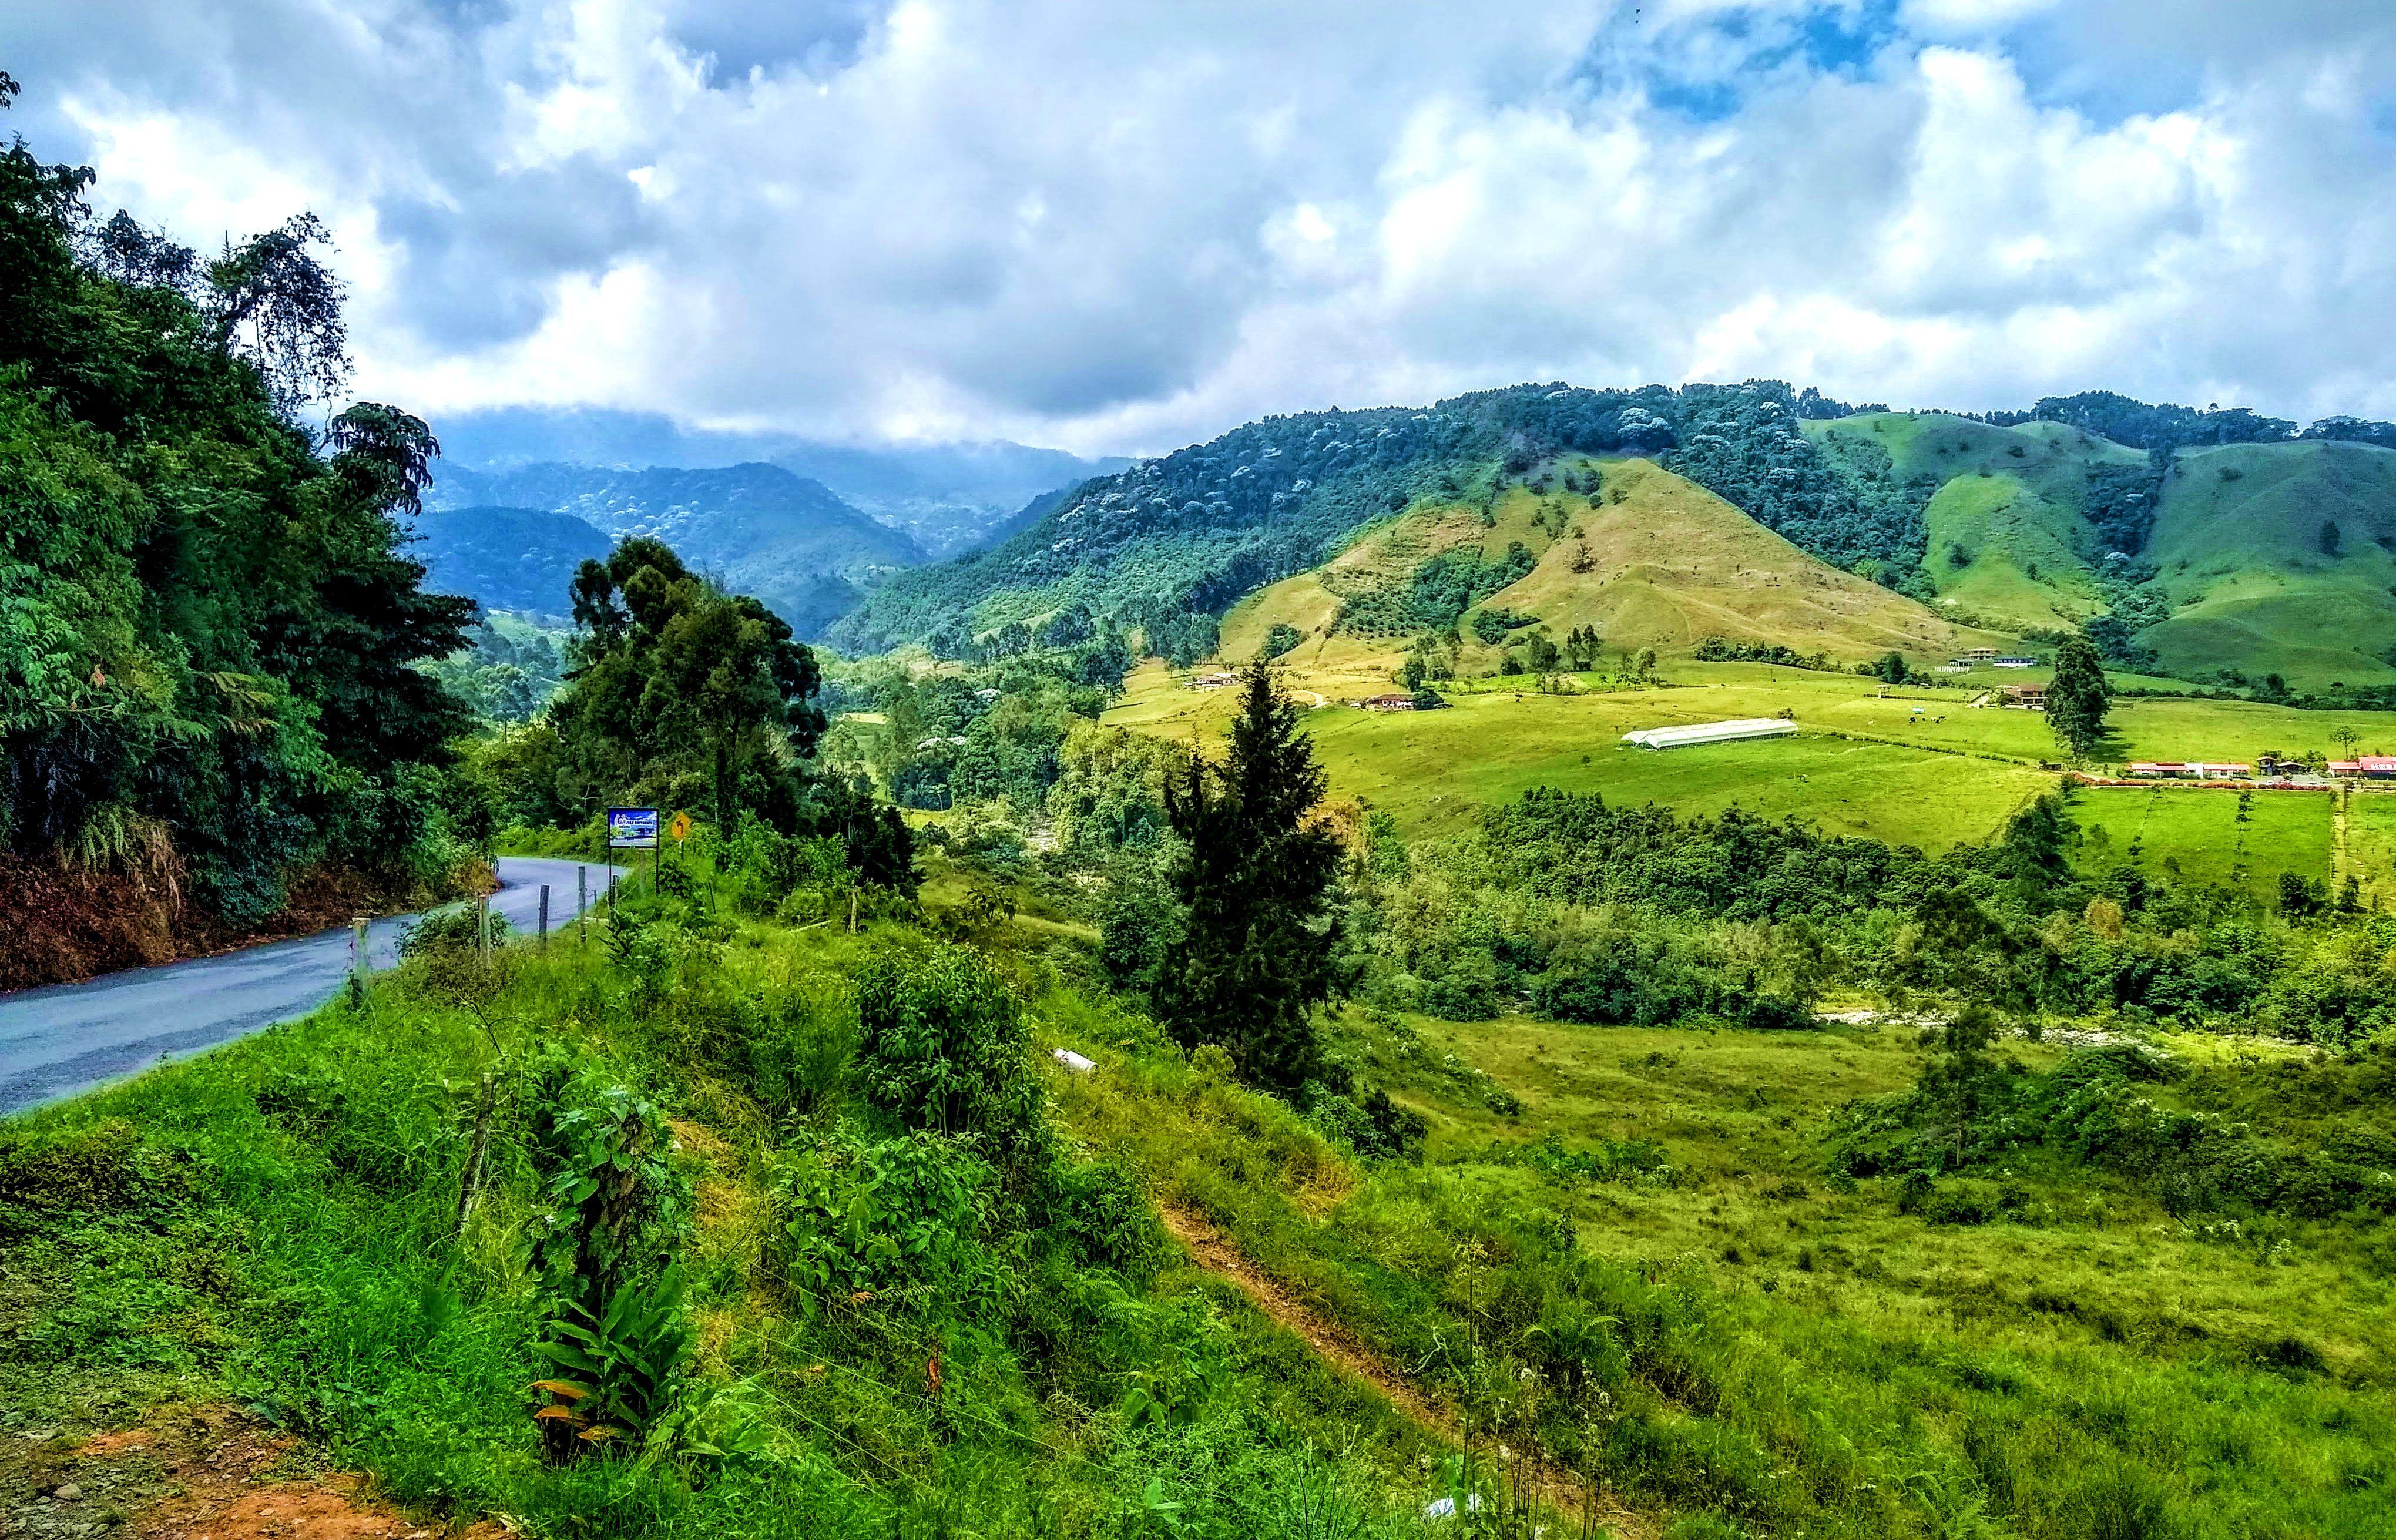 Santa Rosa de Cabal landscape